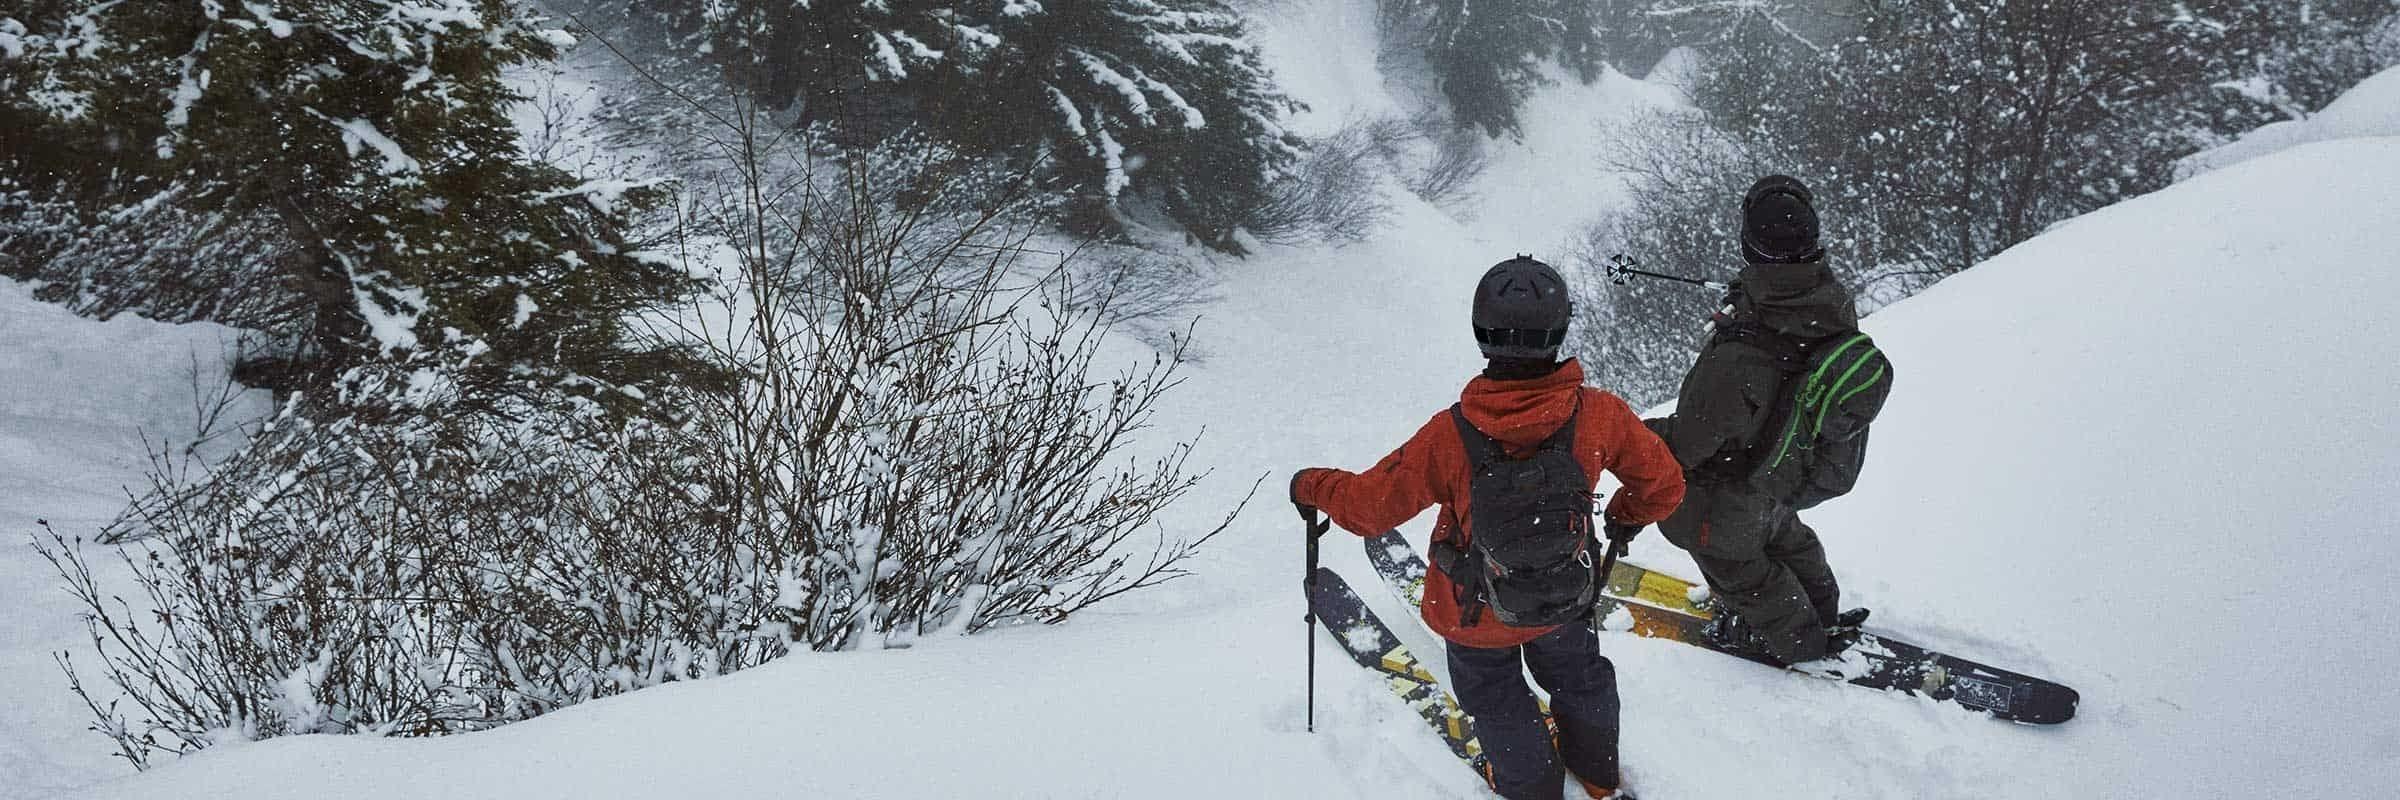 online store 5bef4 e36d1 Discover the 2018 Peak Performance Ski Kits | Altitude Blog